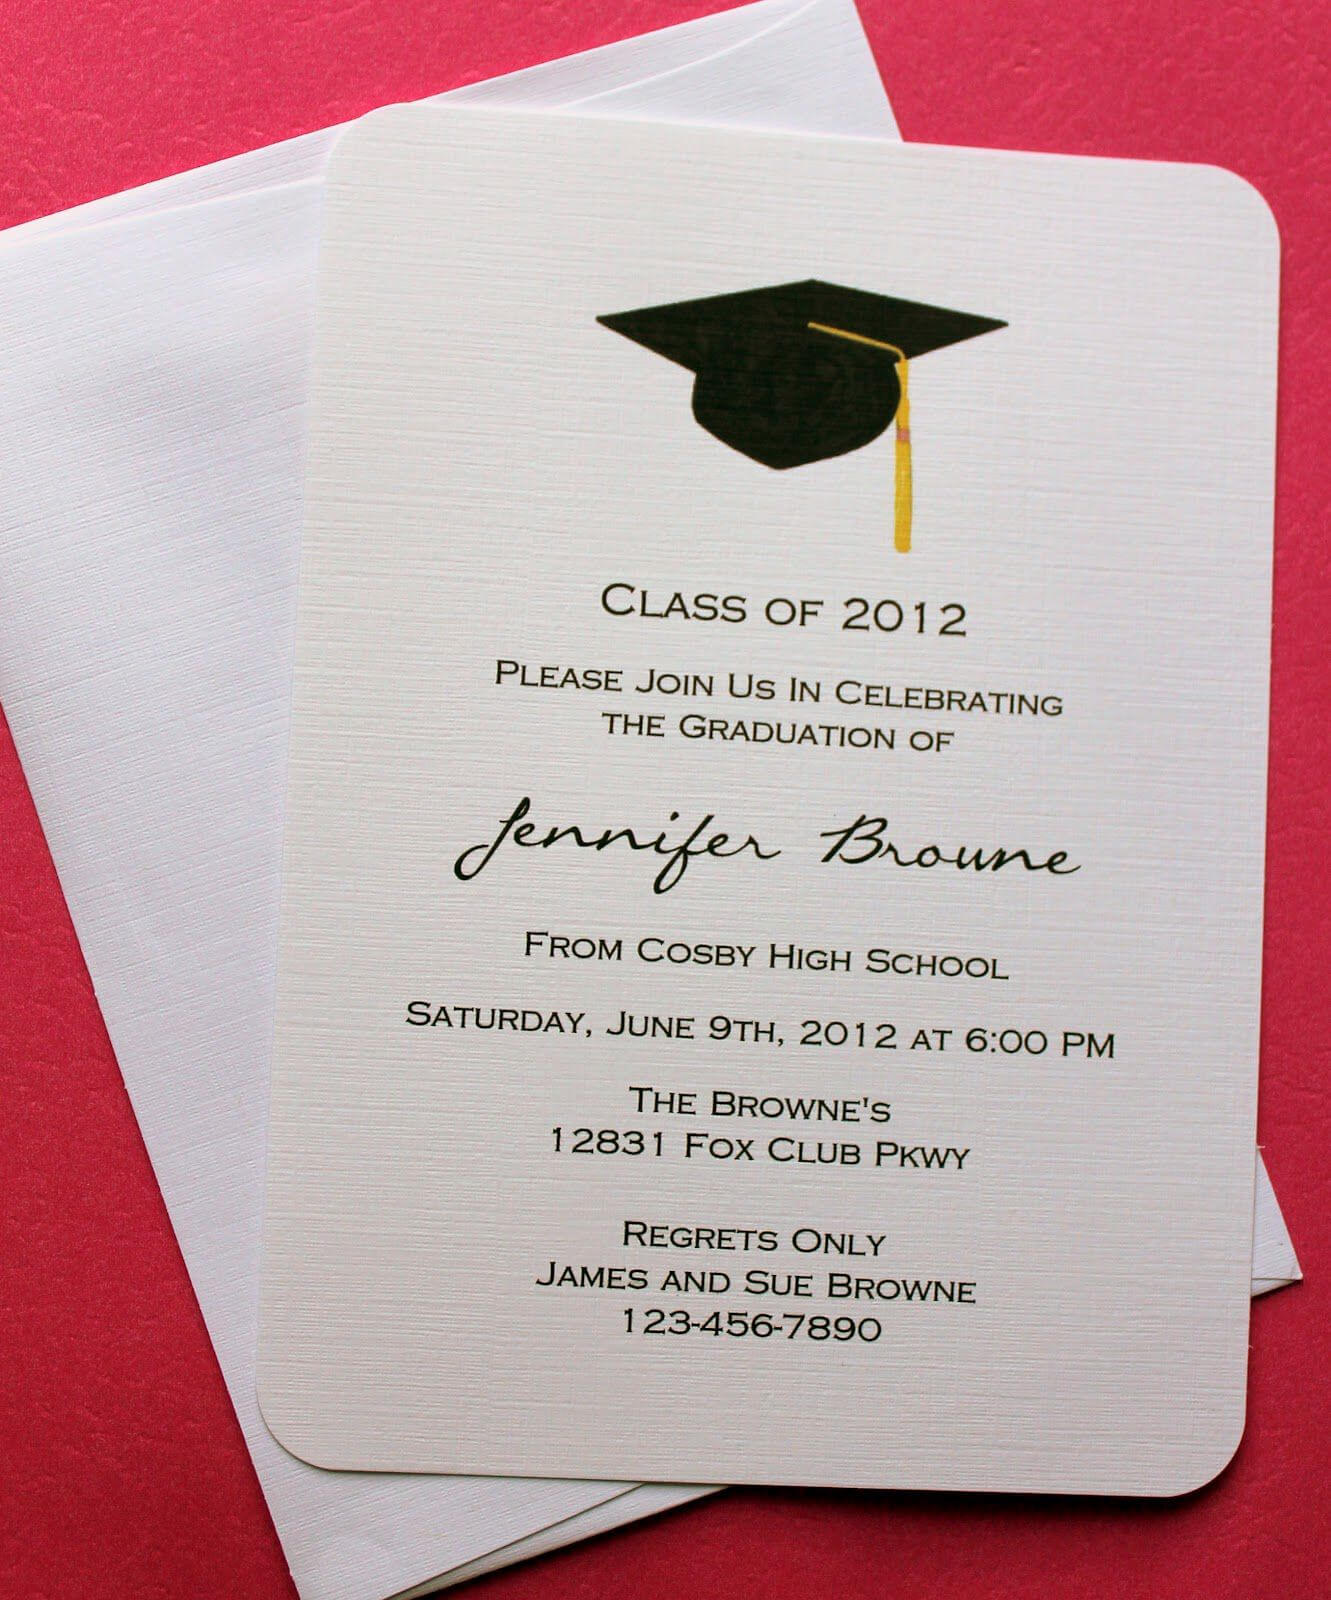 Graduation Invitation Templates Microsoft Word | Invitations In Graduation Invitation Templates Microsoft Word